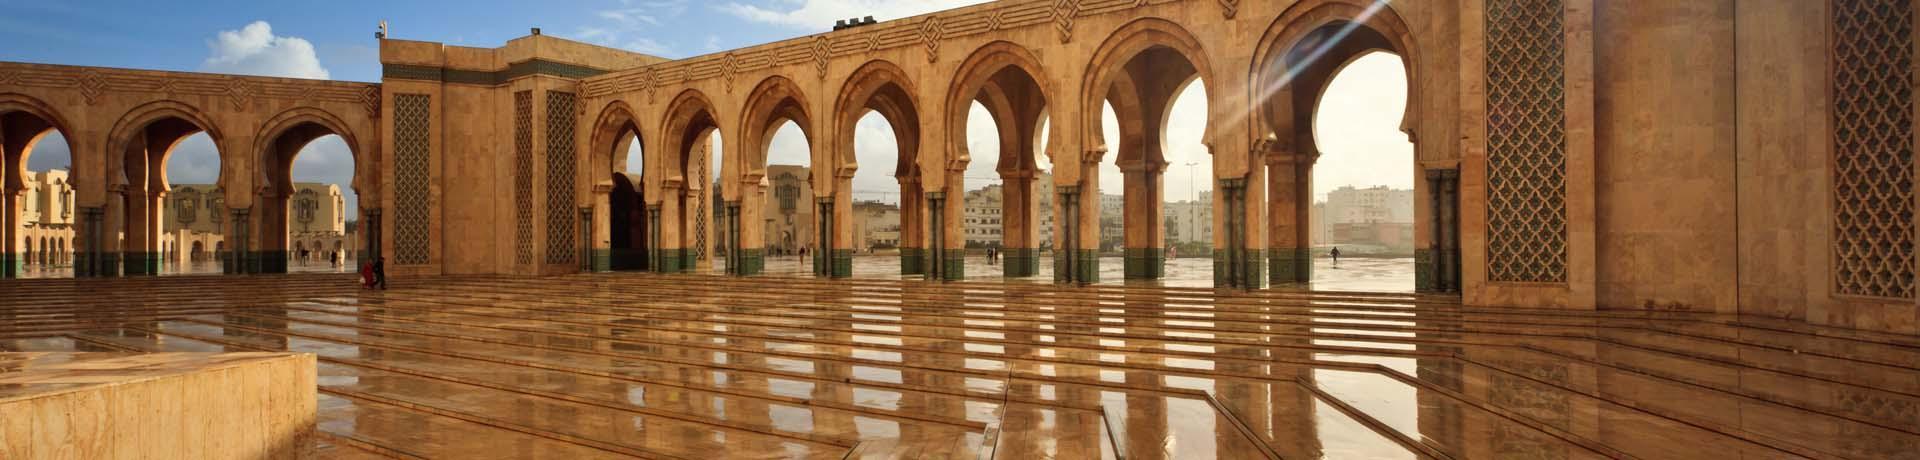 country-id-9-marokko_F1920x460.jpg